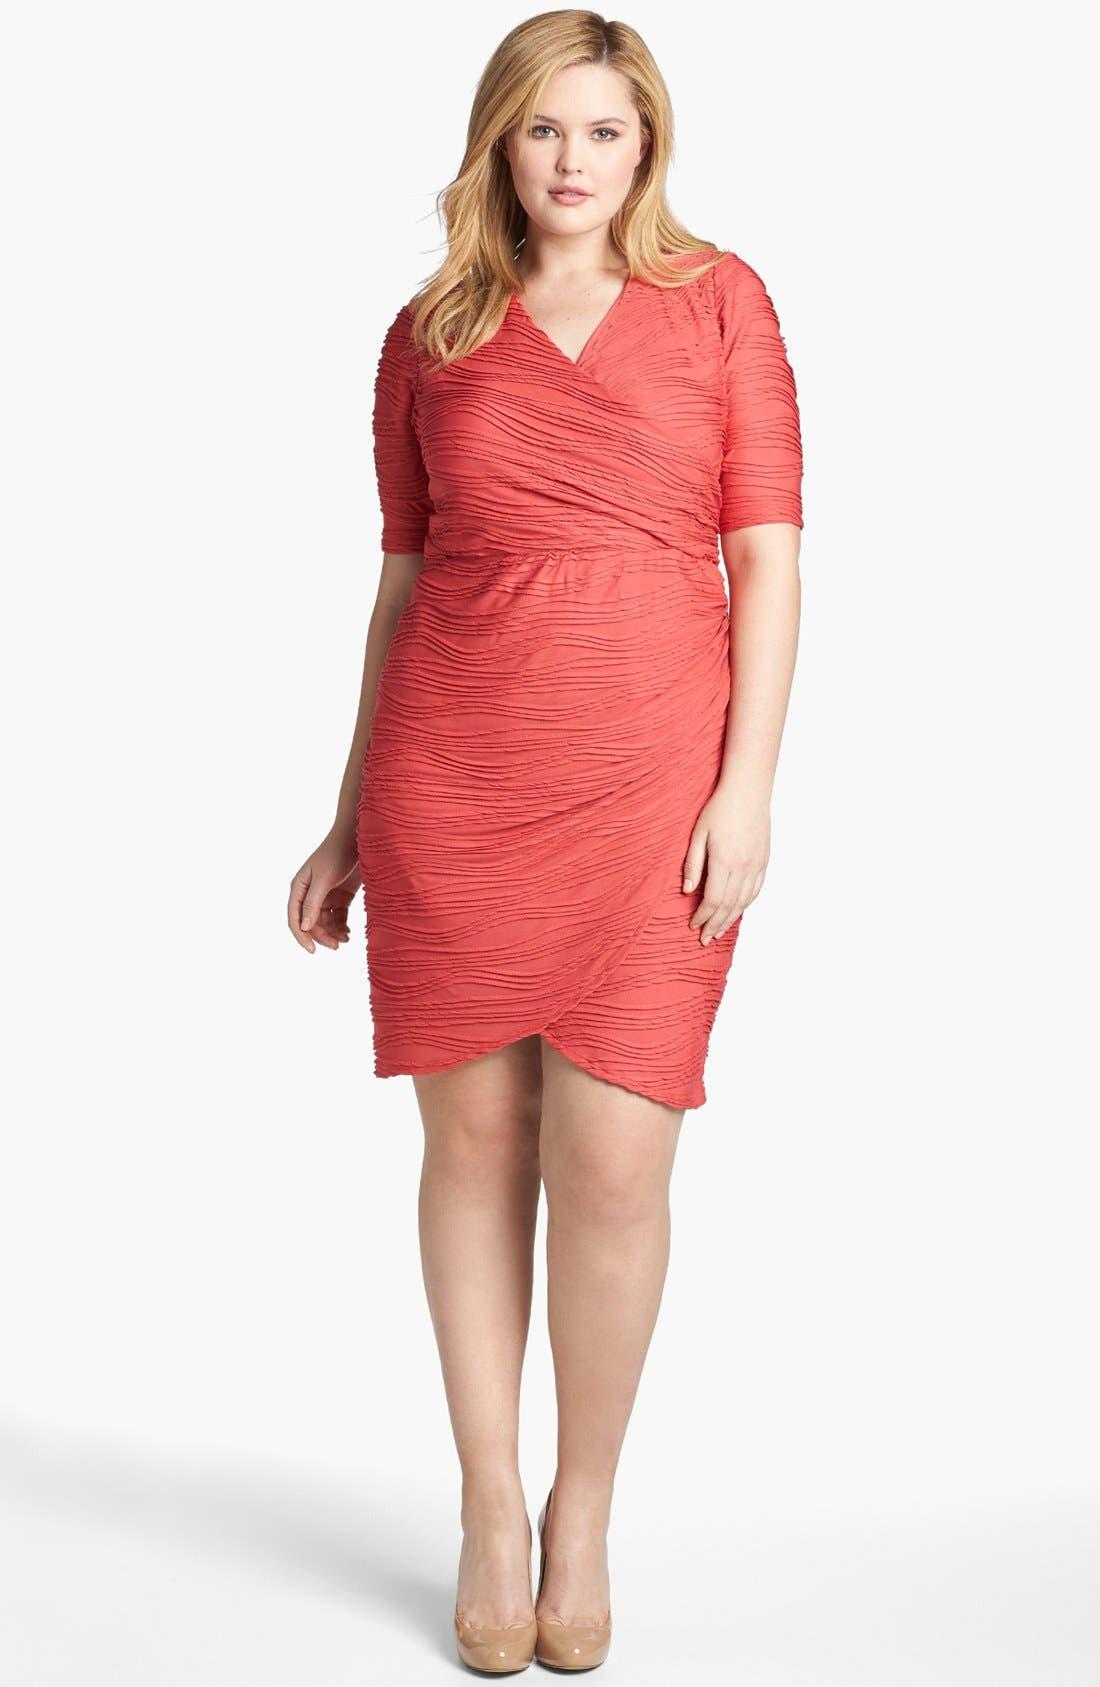 Alternate Image 1 Selected - London Times Textured Short Sleeve Sheath Dress (Plus Size)